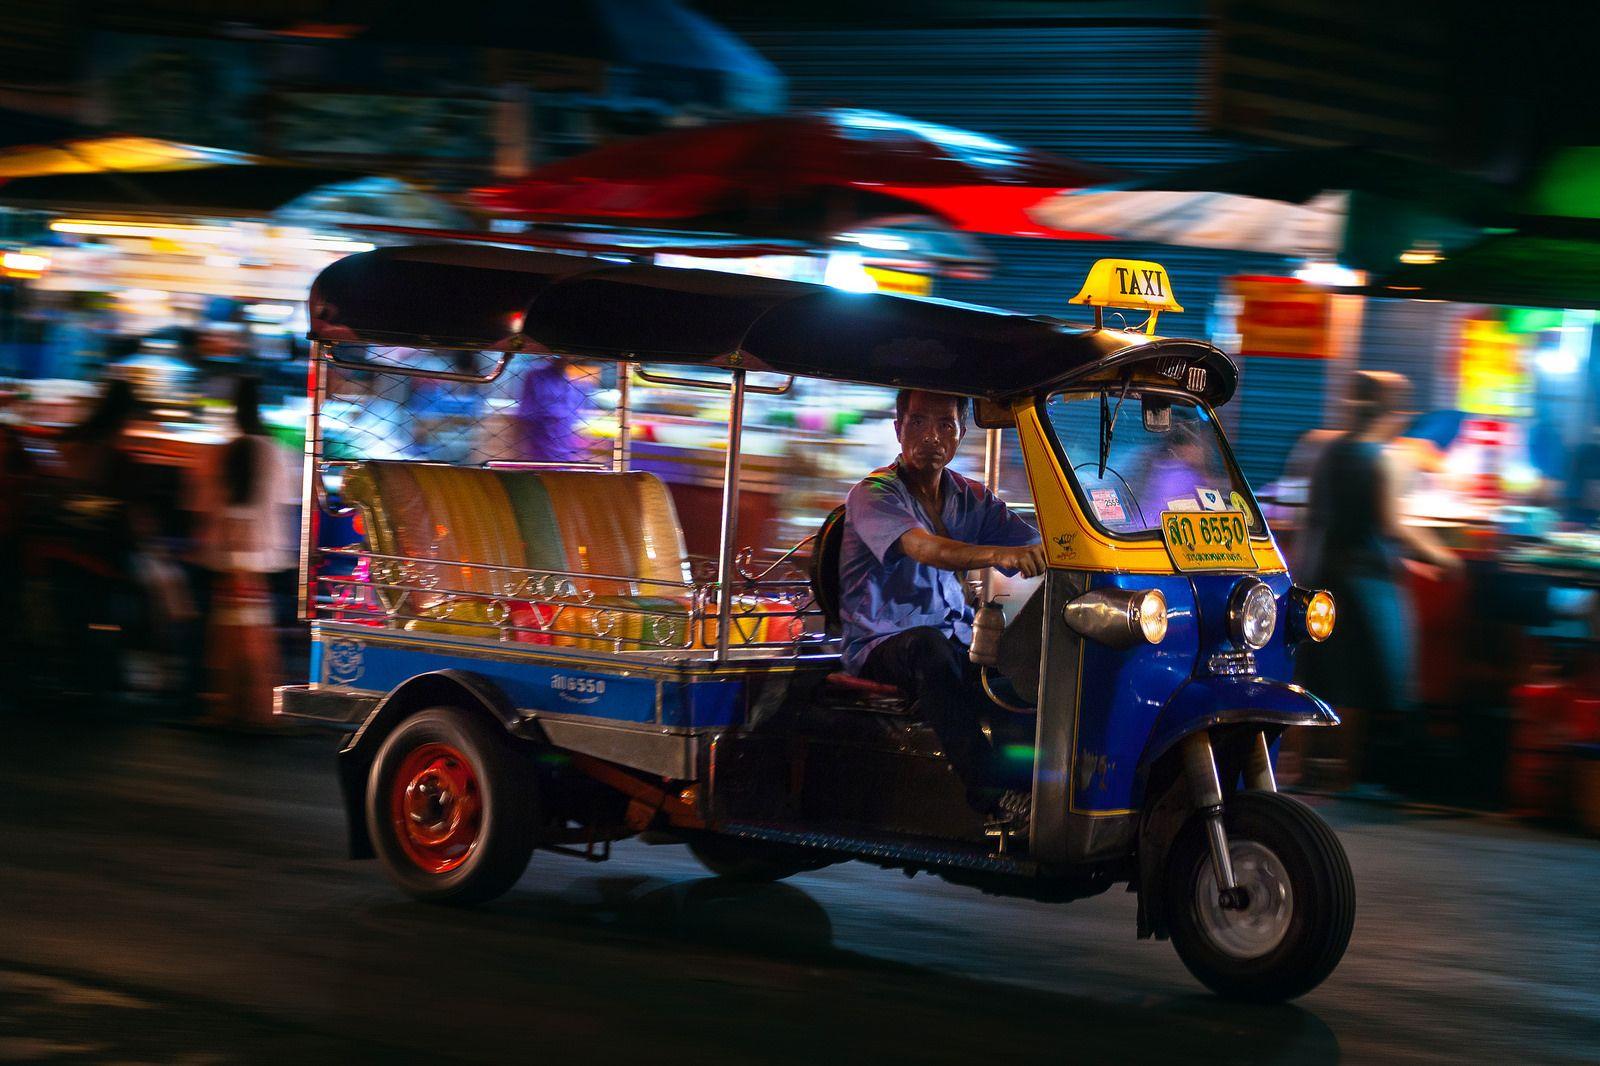 Mr tuk tuk with images thailand travel leisure